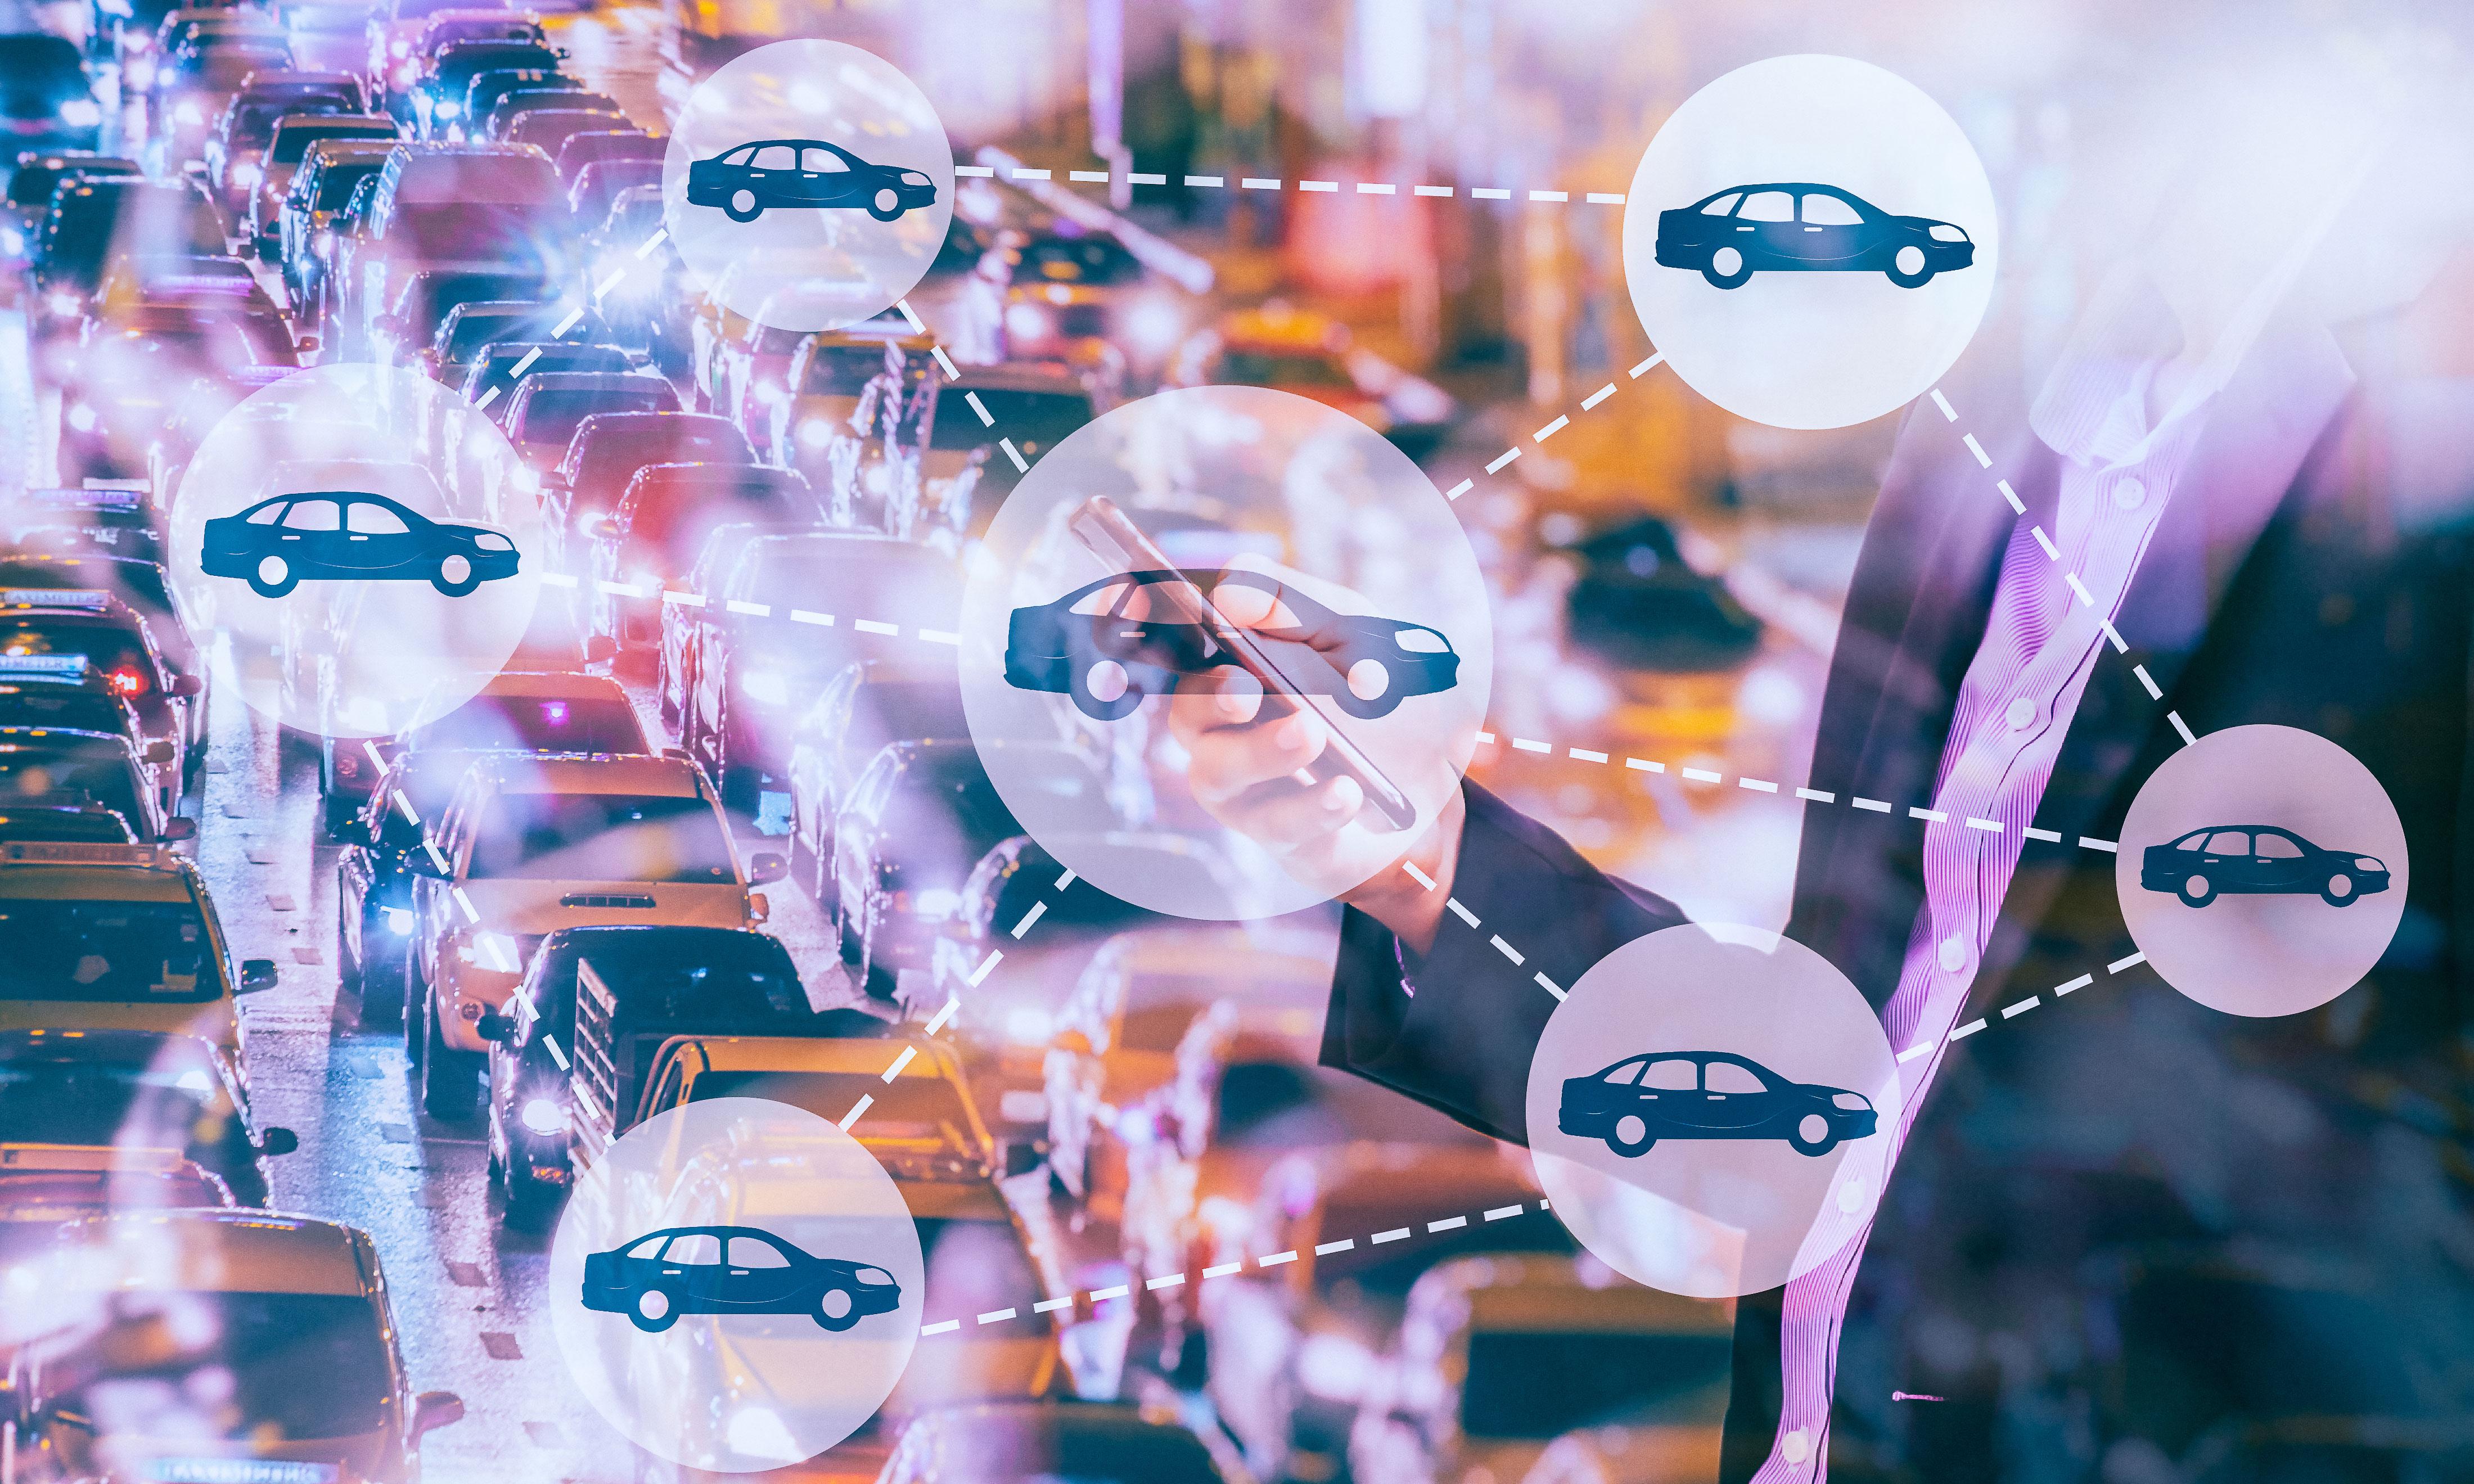 Renault-Nissan-Mitsubishi and DiDi Chuxing sign MOU to explore car-sharing partnership in China